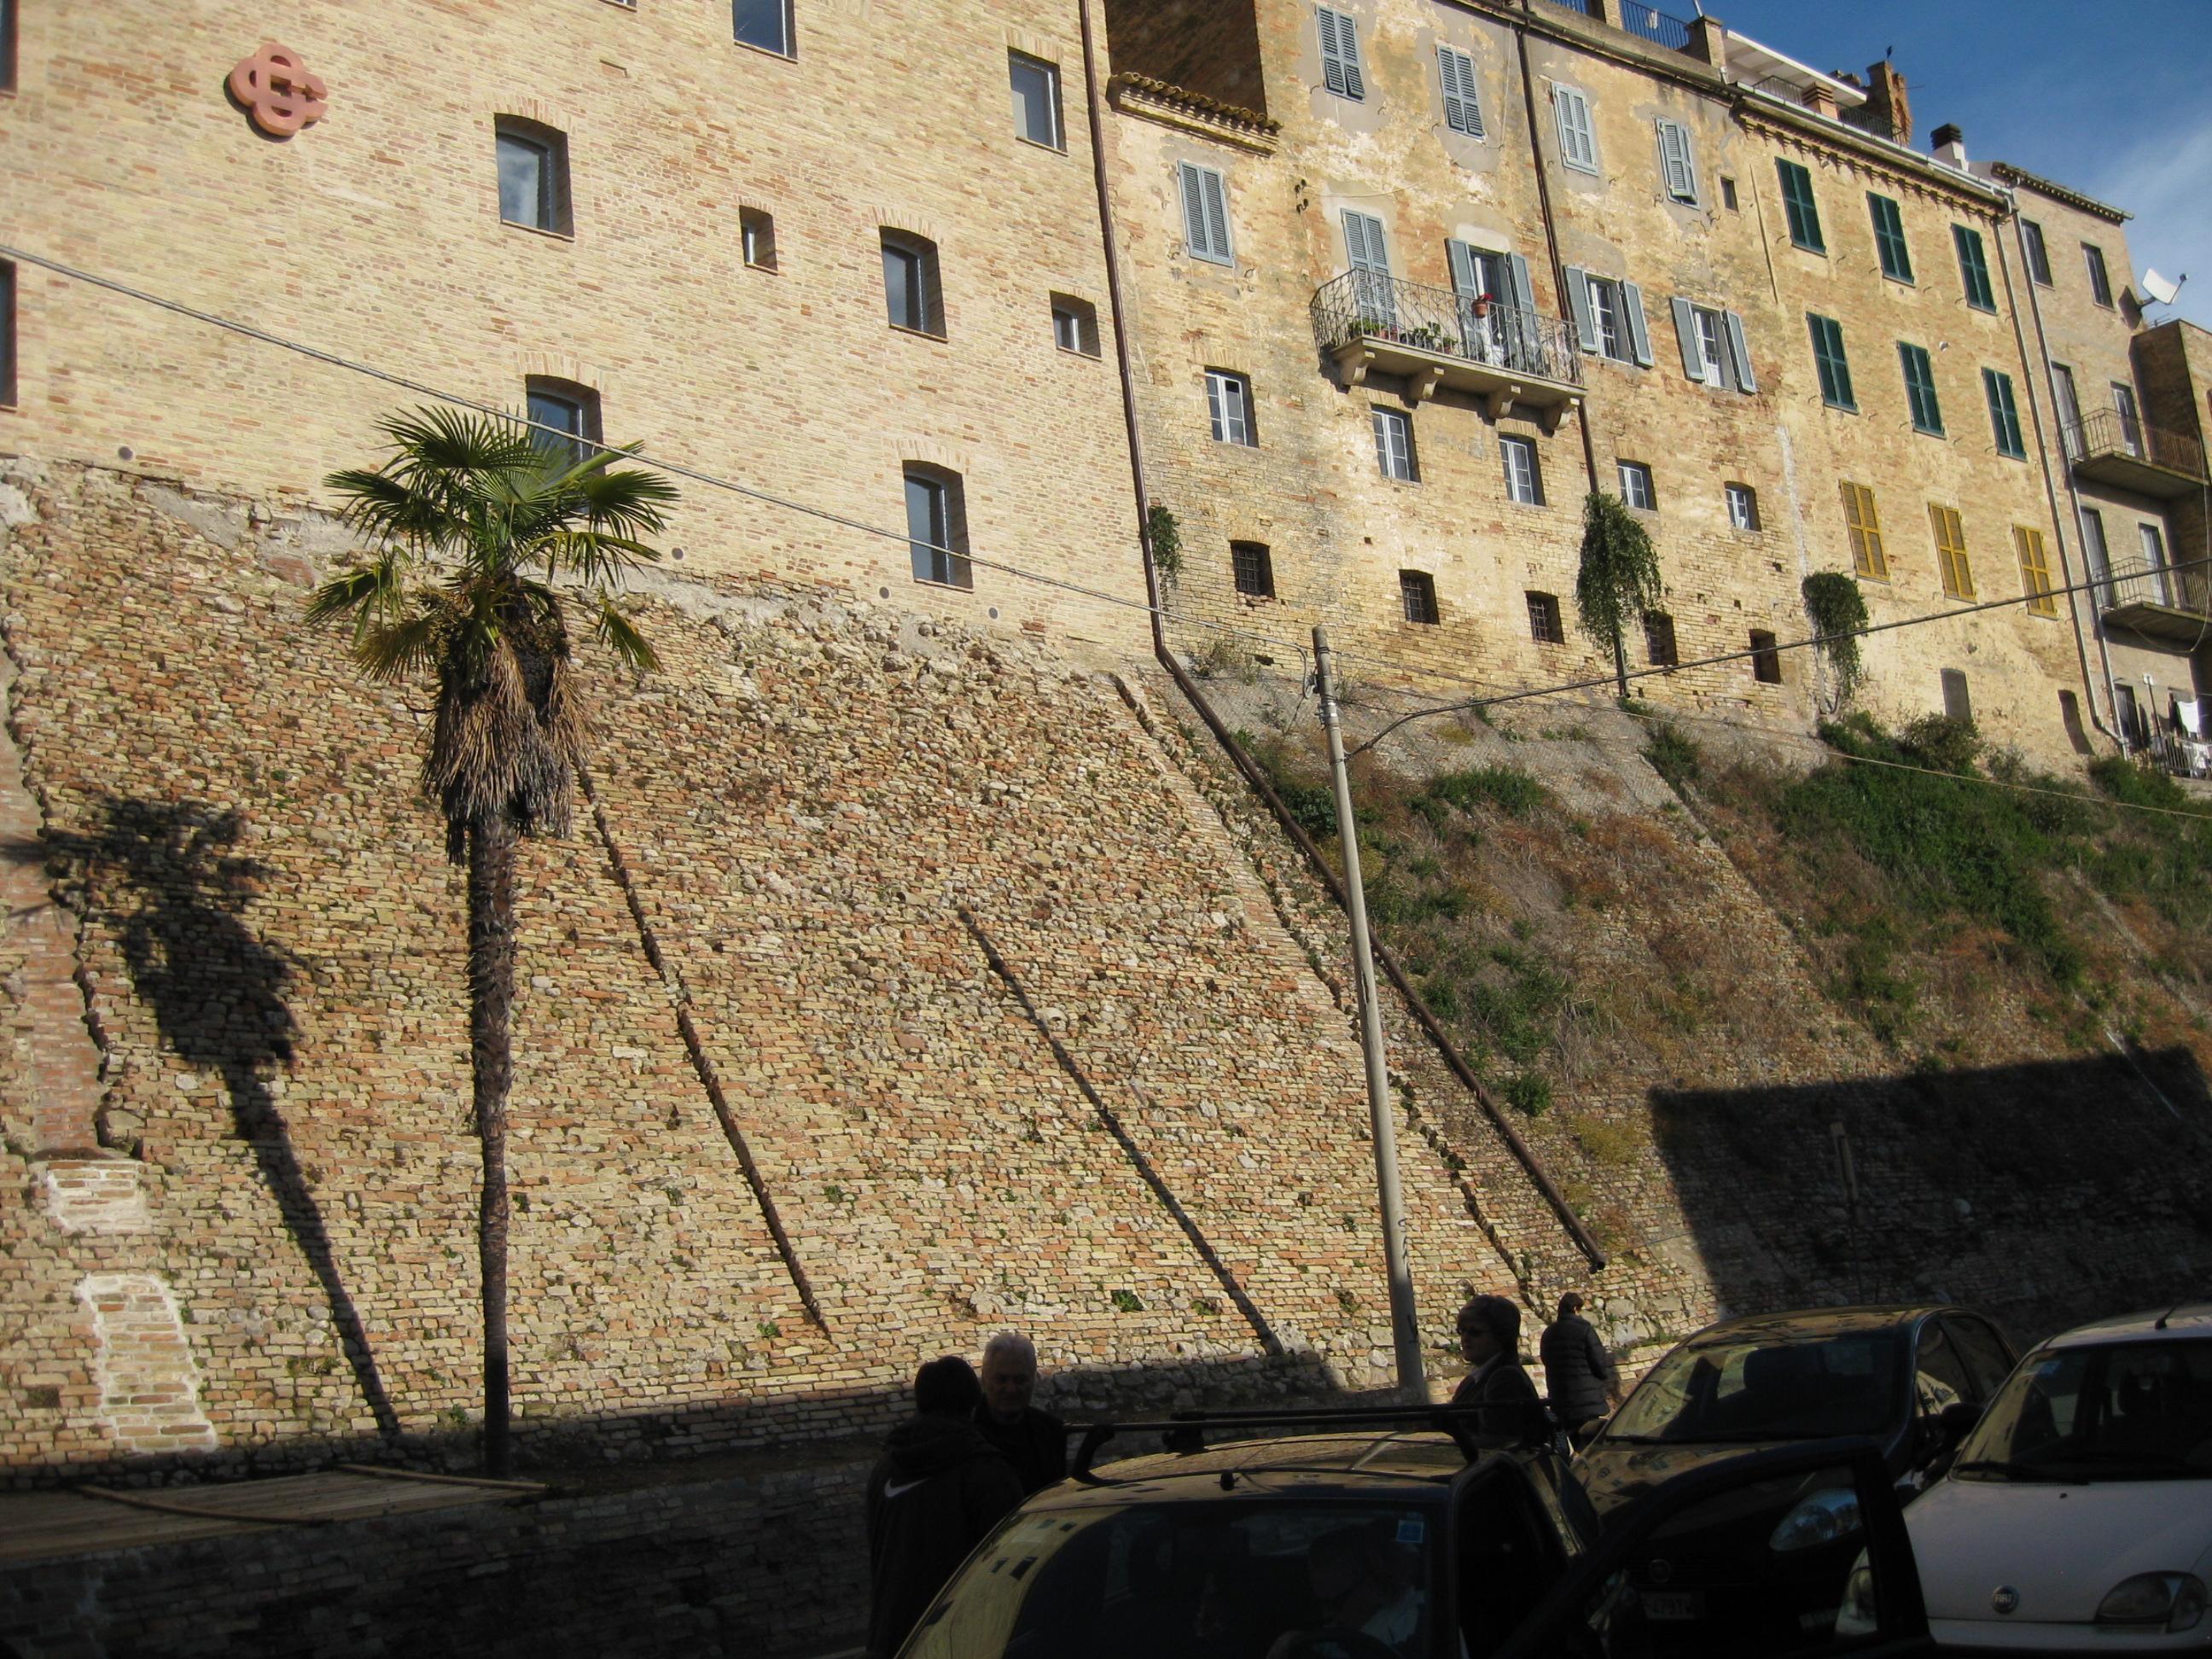 Mura castellane acquavivane